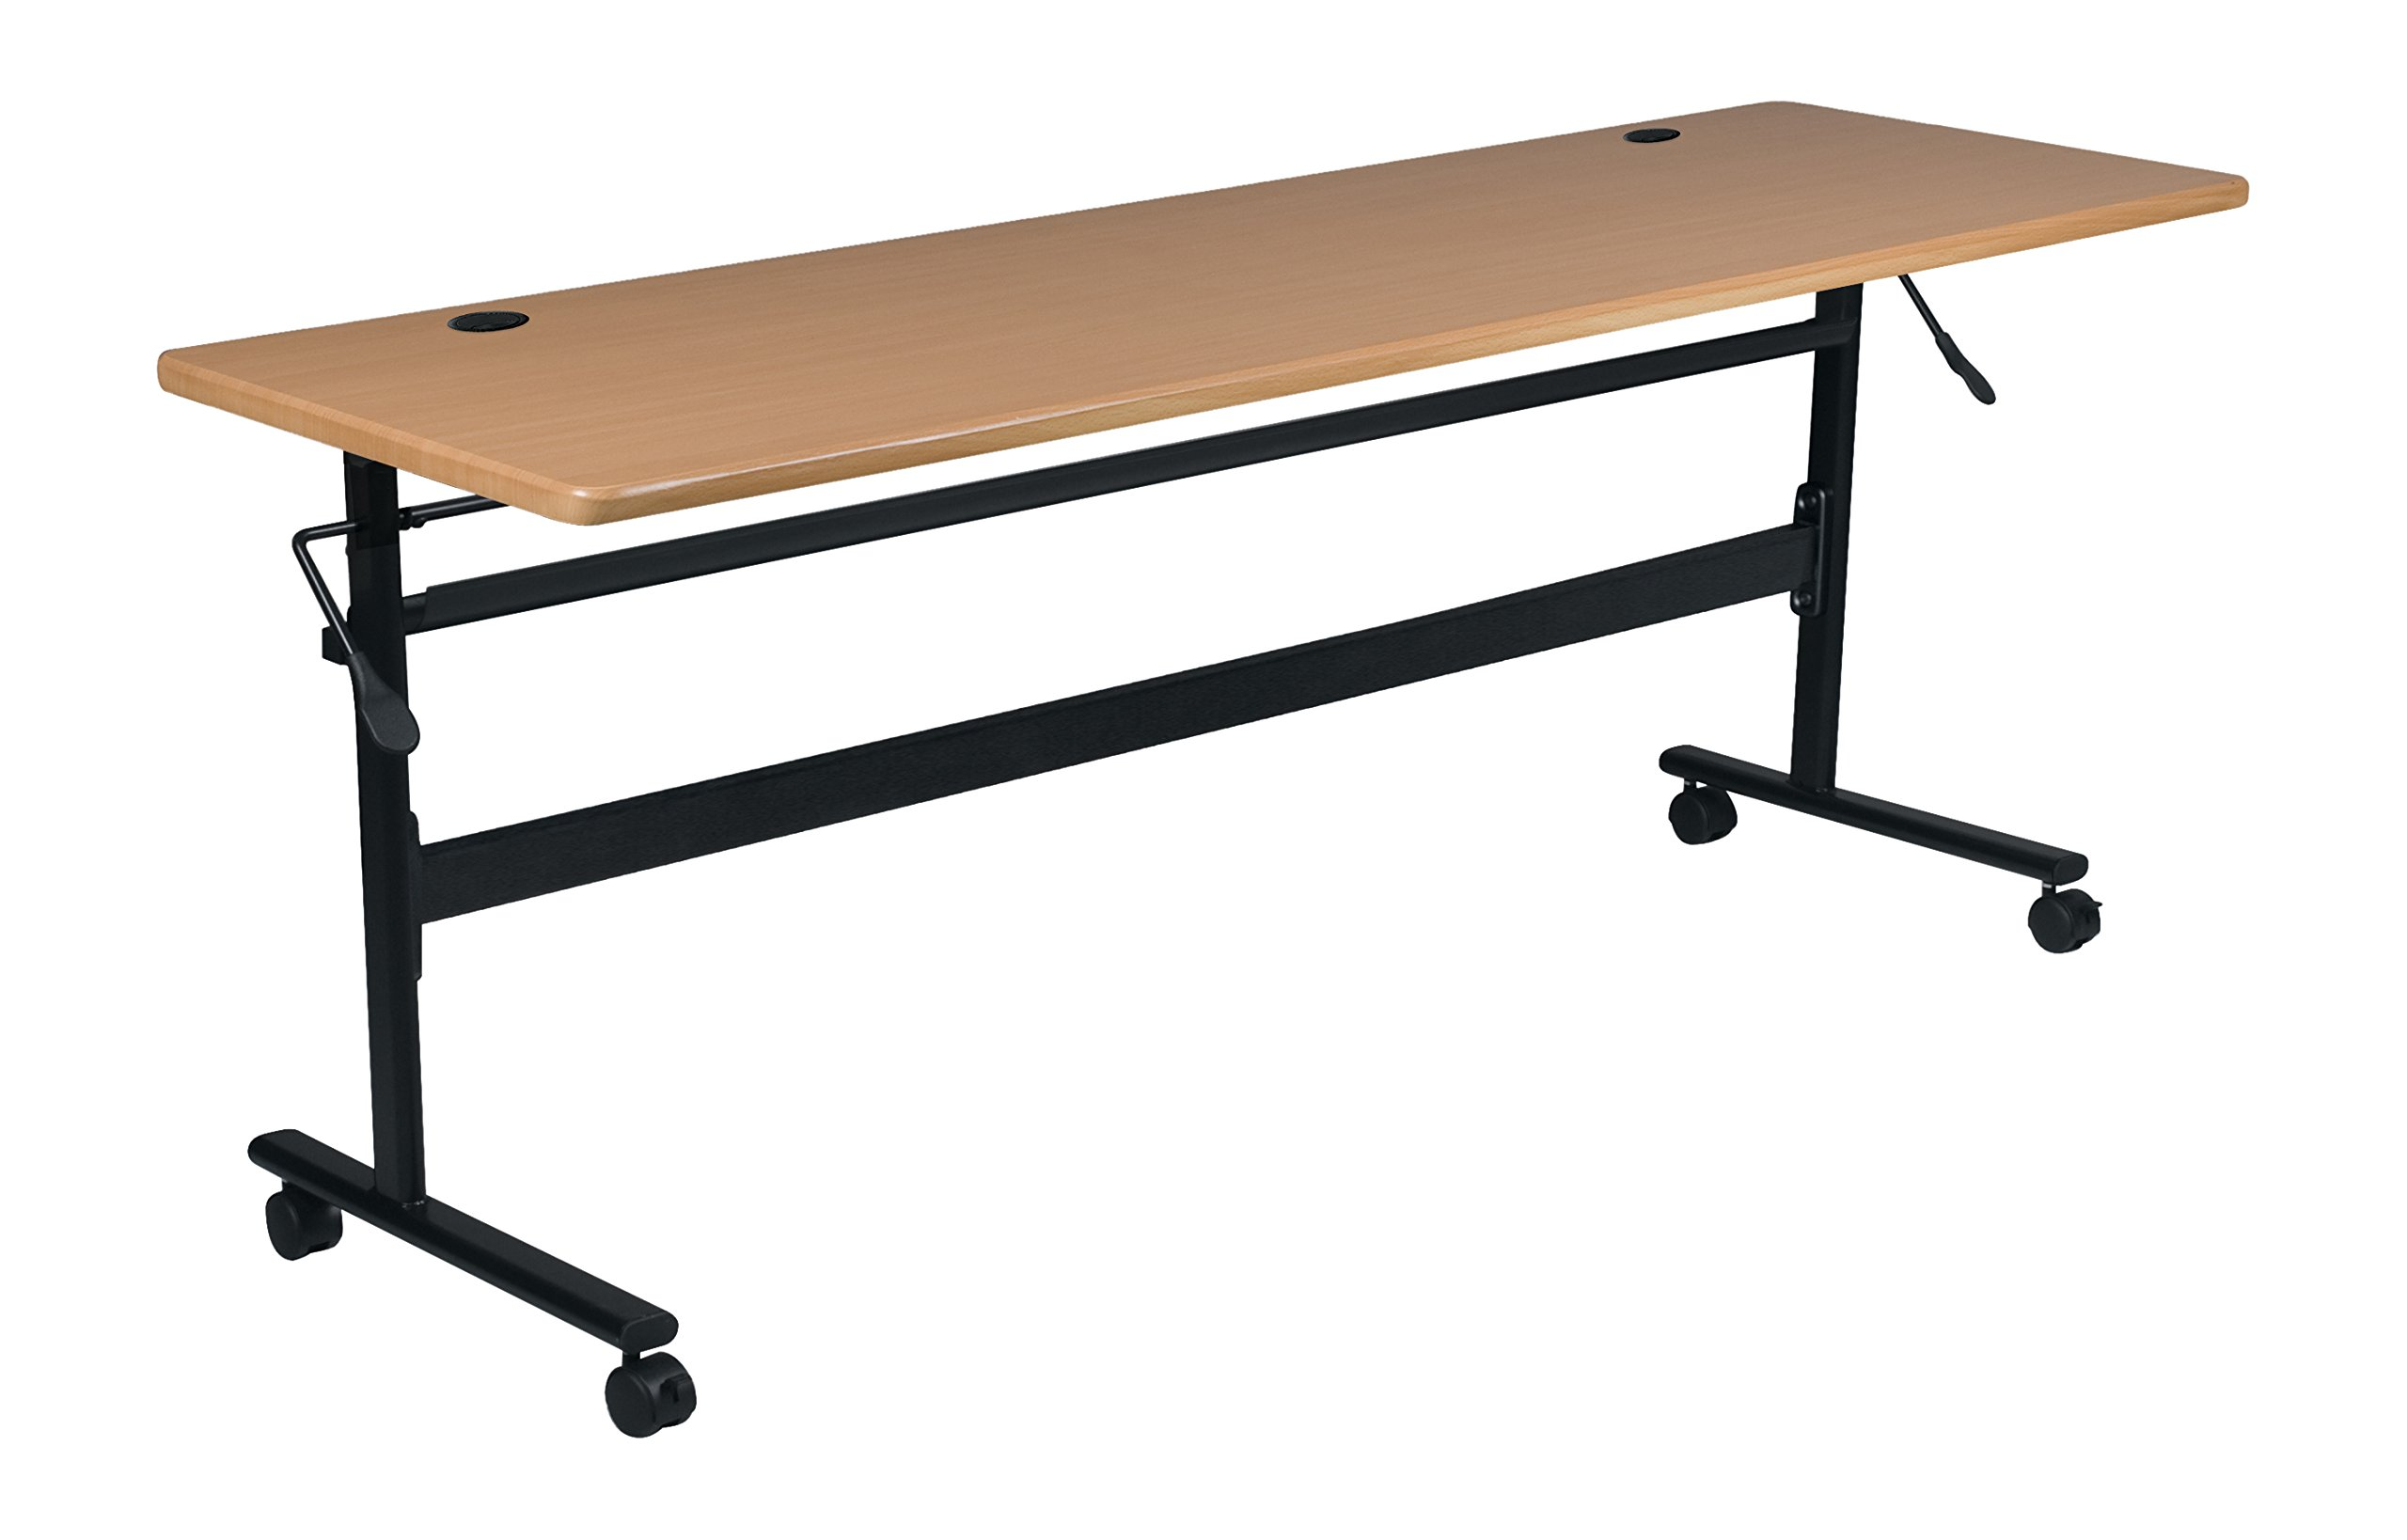 MooreCo Essentials Flipper Training Table 60x24 Teak Top Black Base (90093) by MooreCo (Image #1)